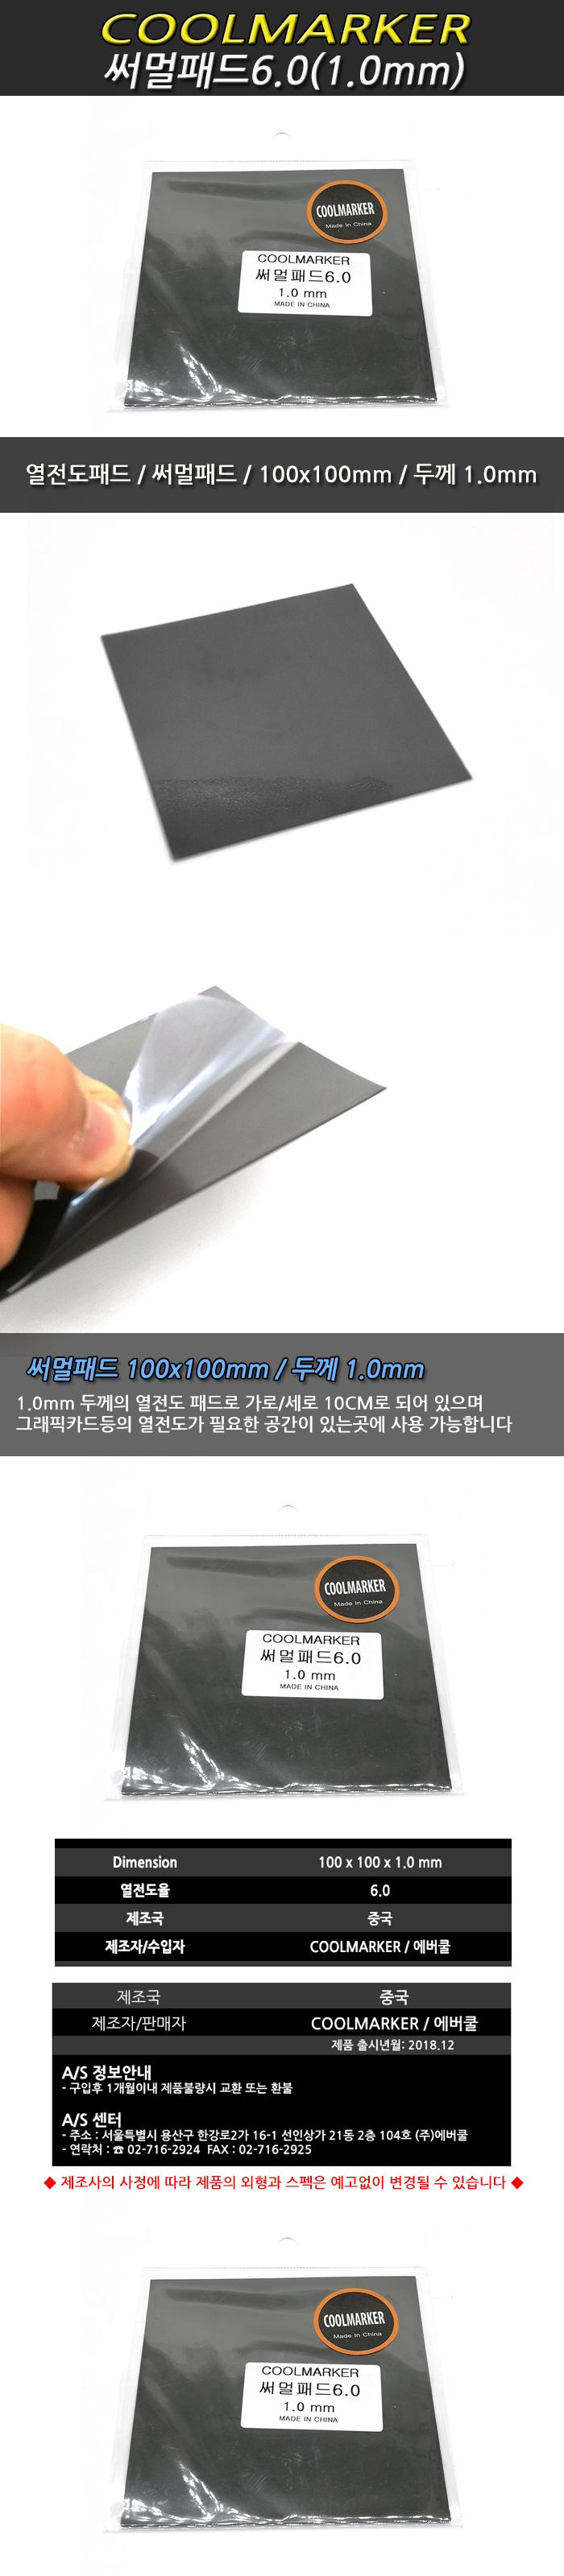 EVERCOOL COOLMARKER 써멀패드6.0(1.0mm)